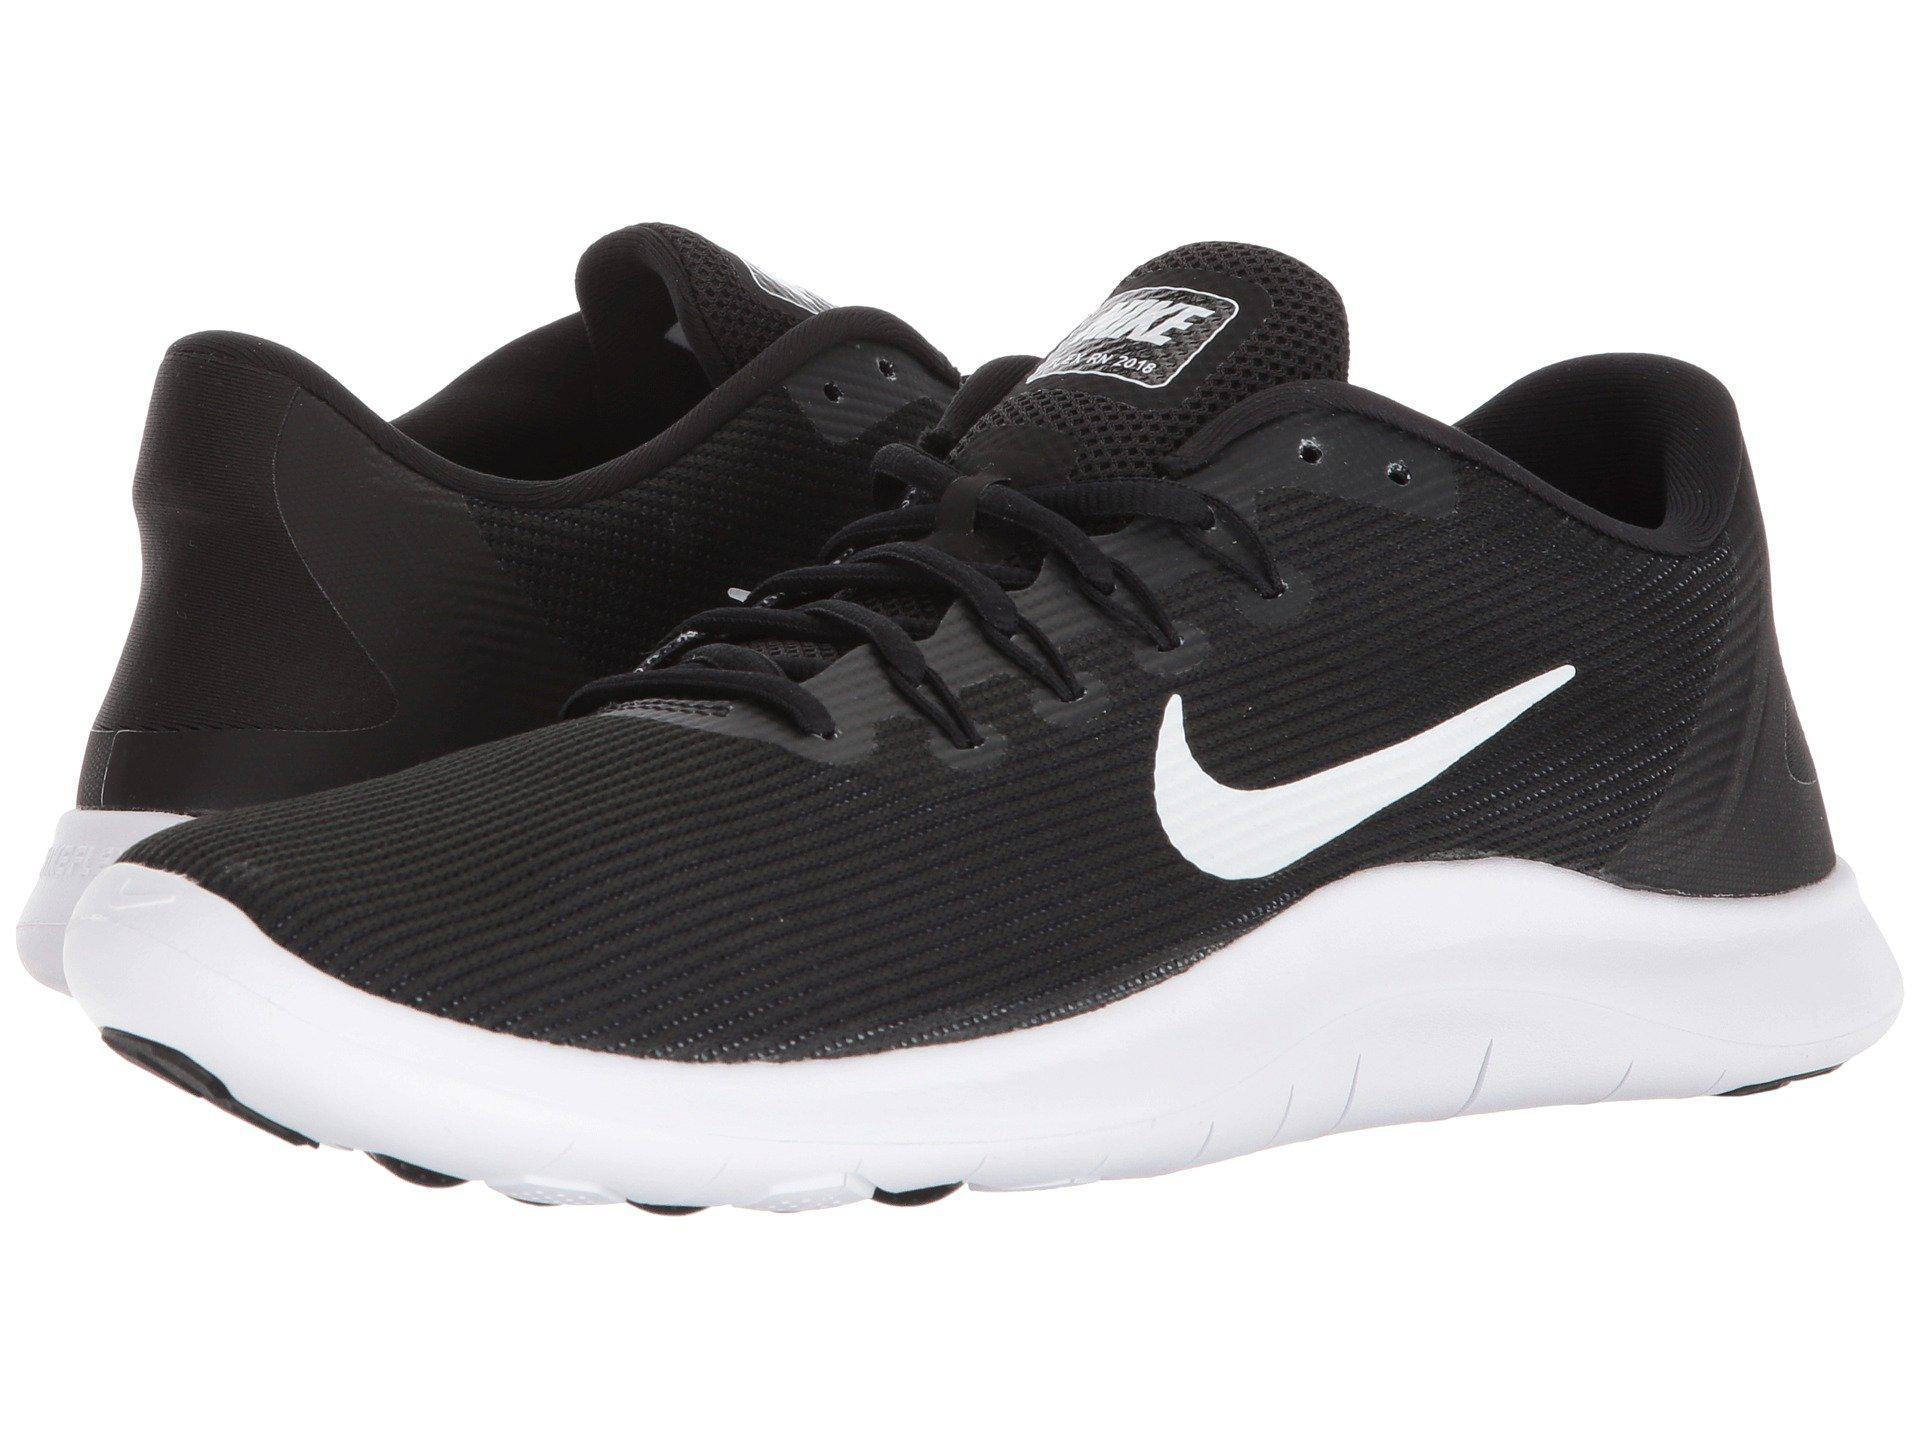 último diseño auténtico diseño profesional Nike Synthetic Flex Rn 2018 (black/white) Men's Running Shoes for ...